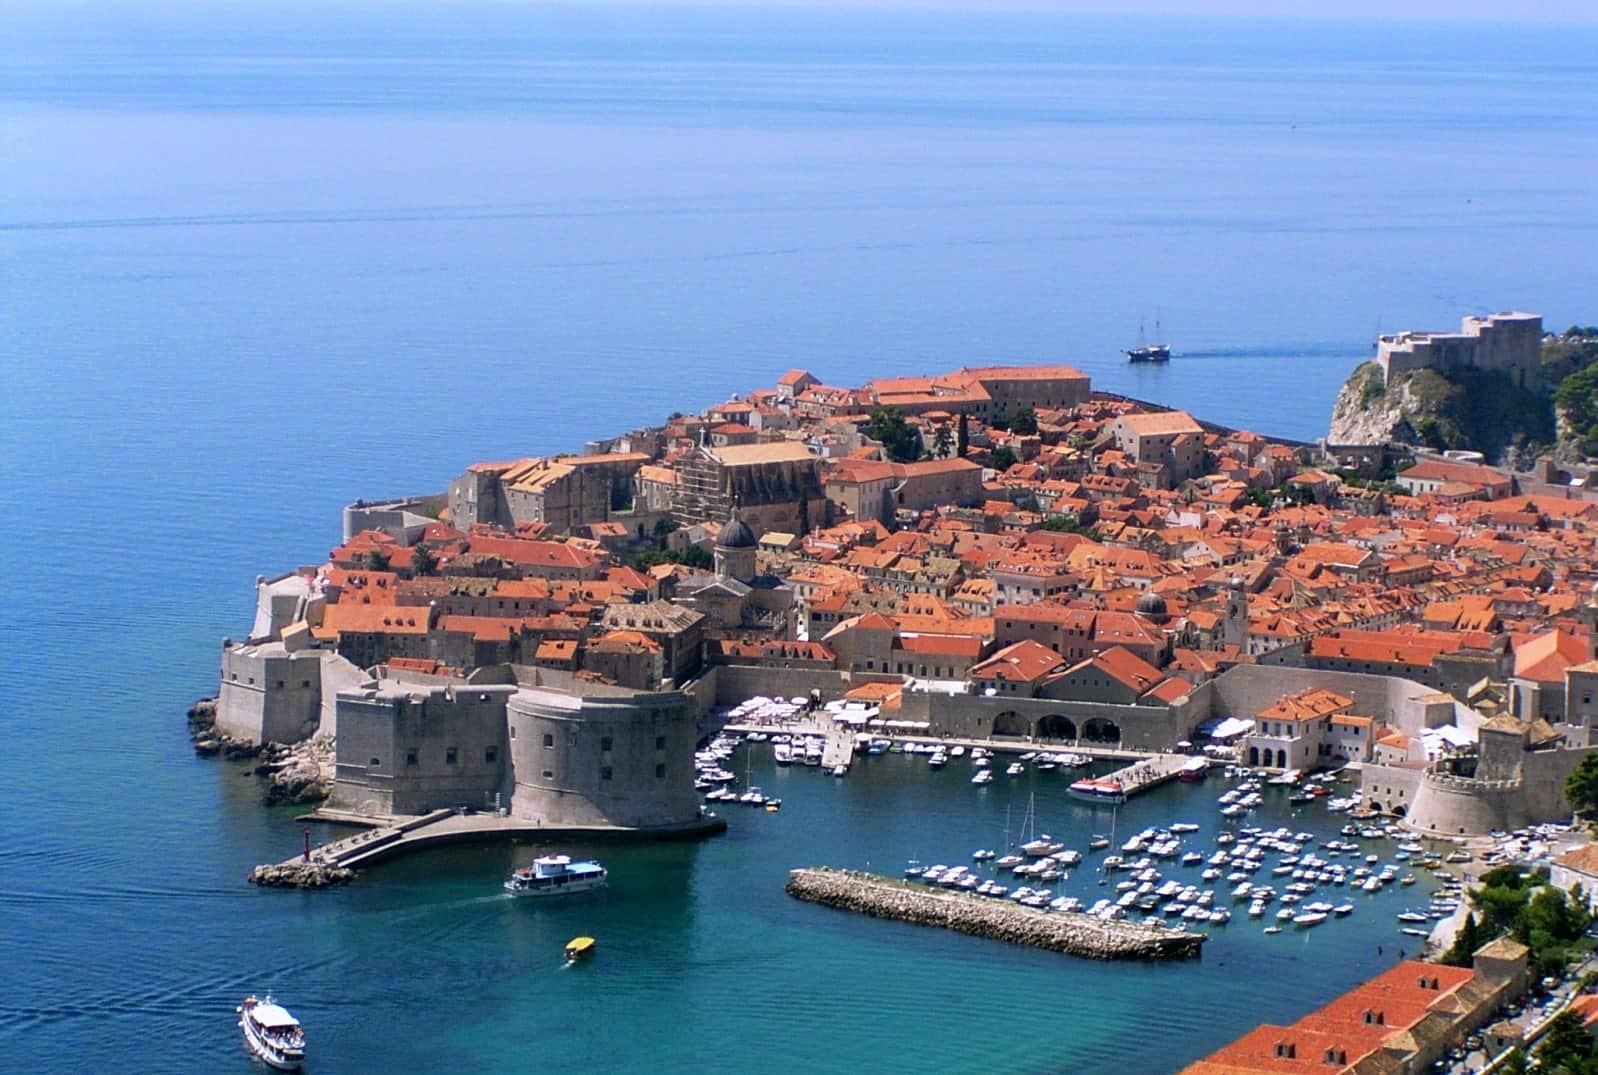 Dubrovnik croatia | Things to do in Dubrovnik